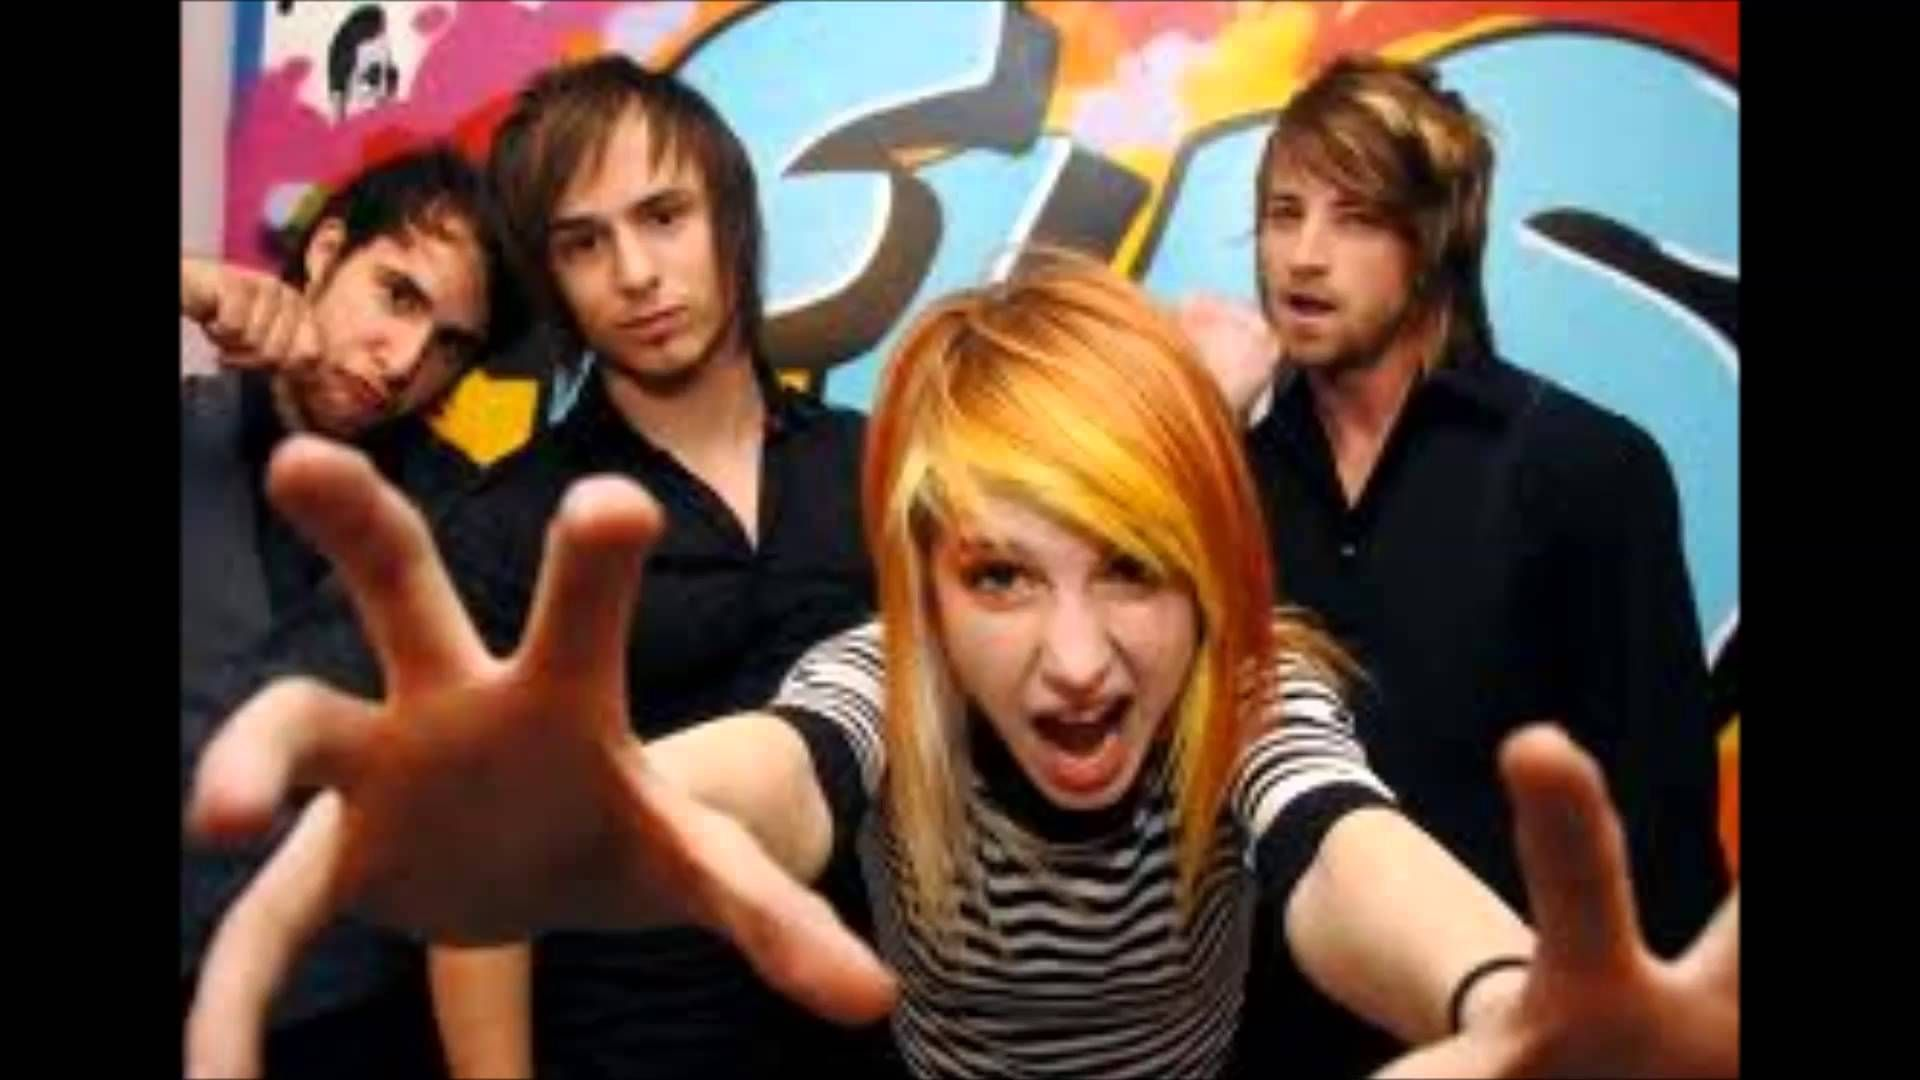 Paramore Group Shot Hayley Williams Fist Alt Punk Rock Music 24x36 Poster Print